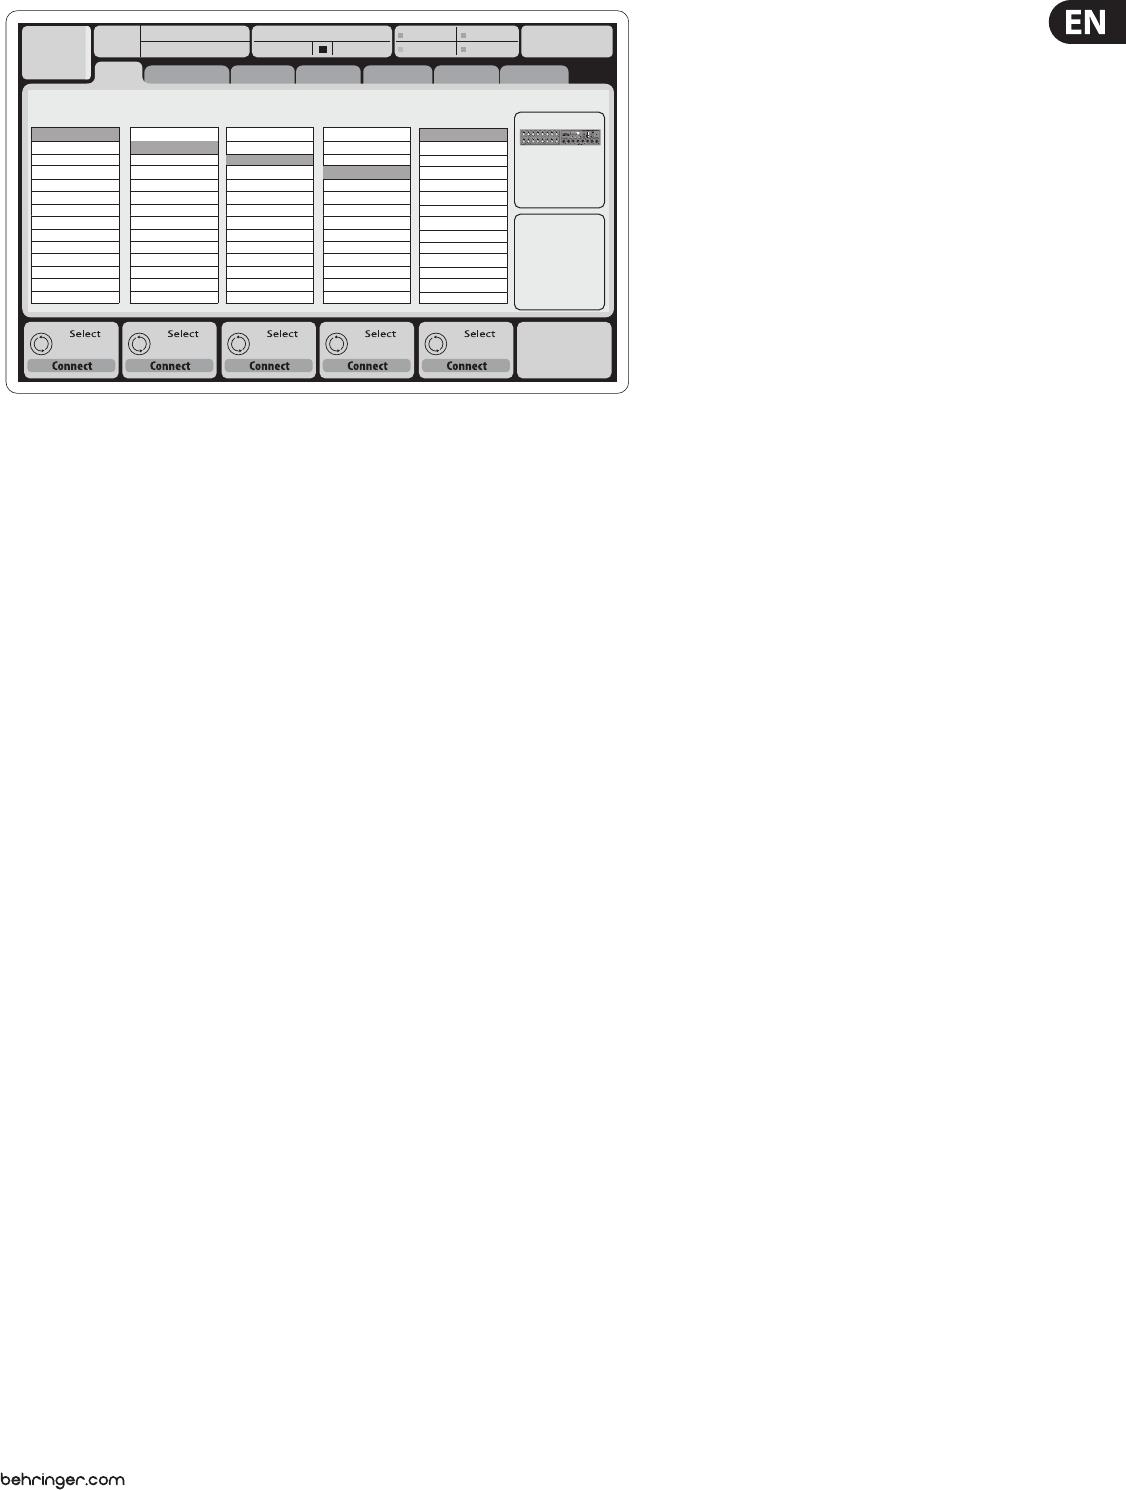 Handleiding Behringer X32 (pagina 9 van 70) (English)